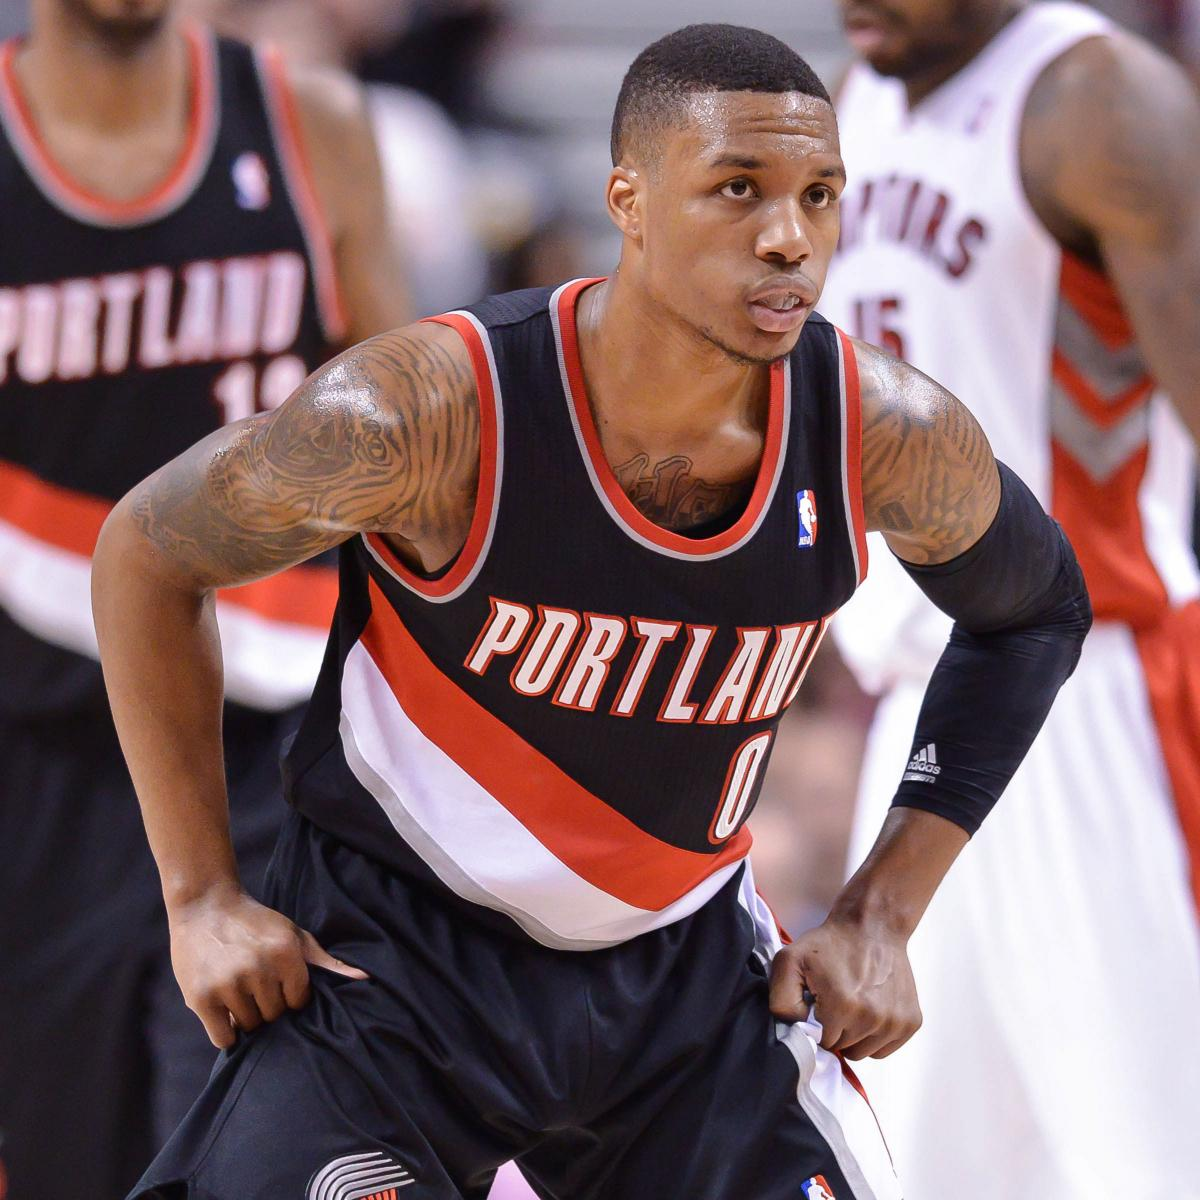 Portland Blazers Defensive Rating